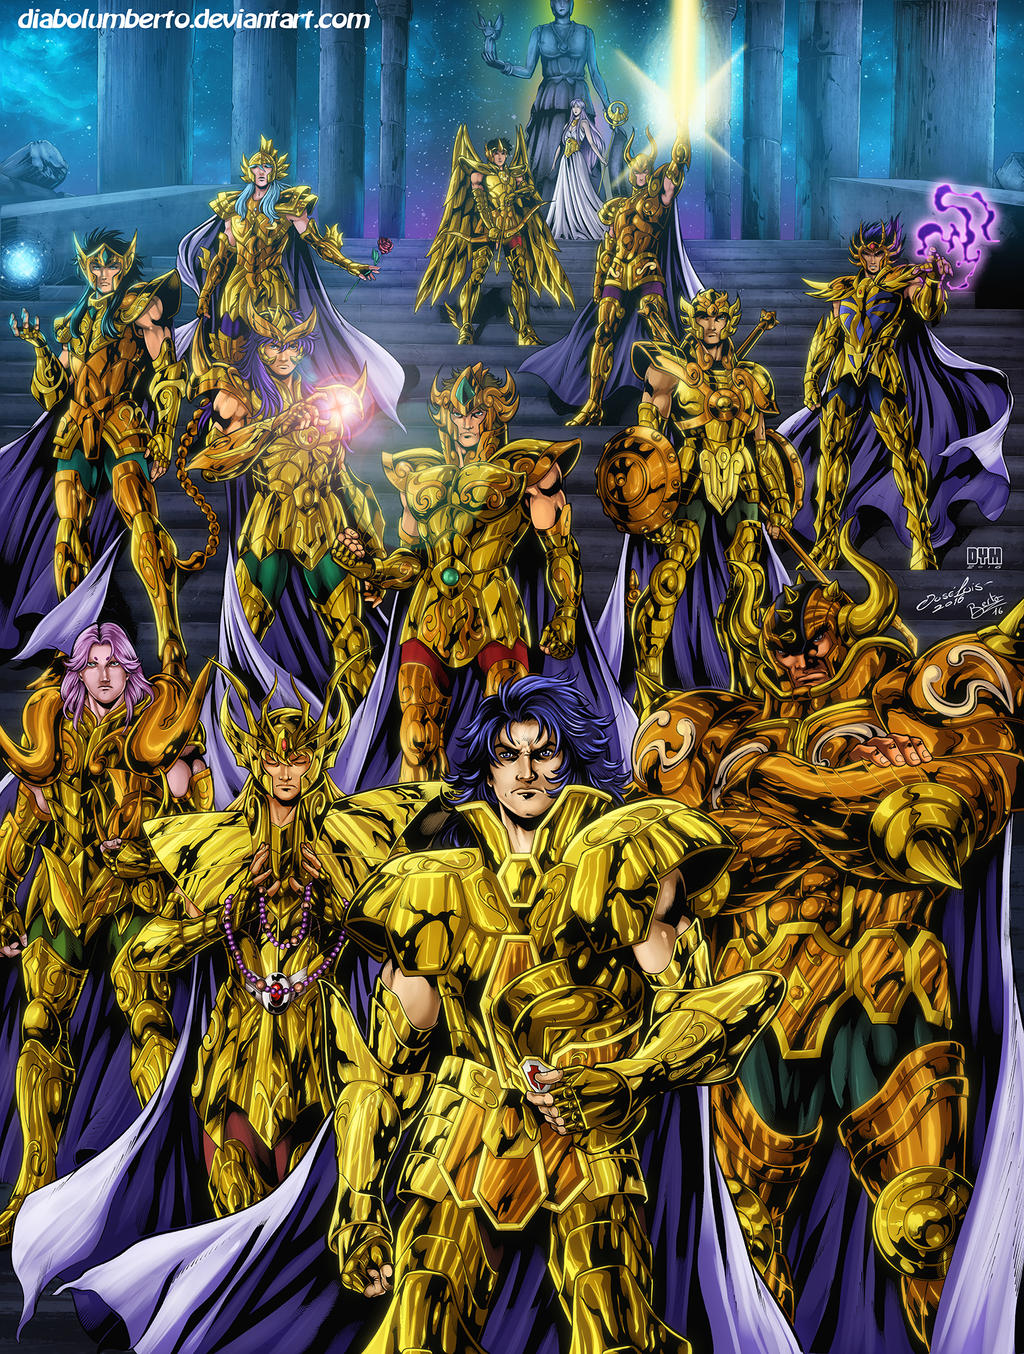 saint seiya   gold saints by diabolumberto on deviantart